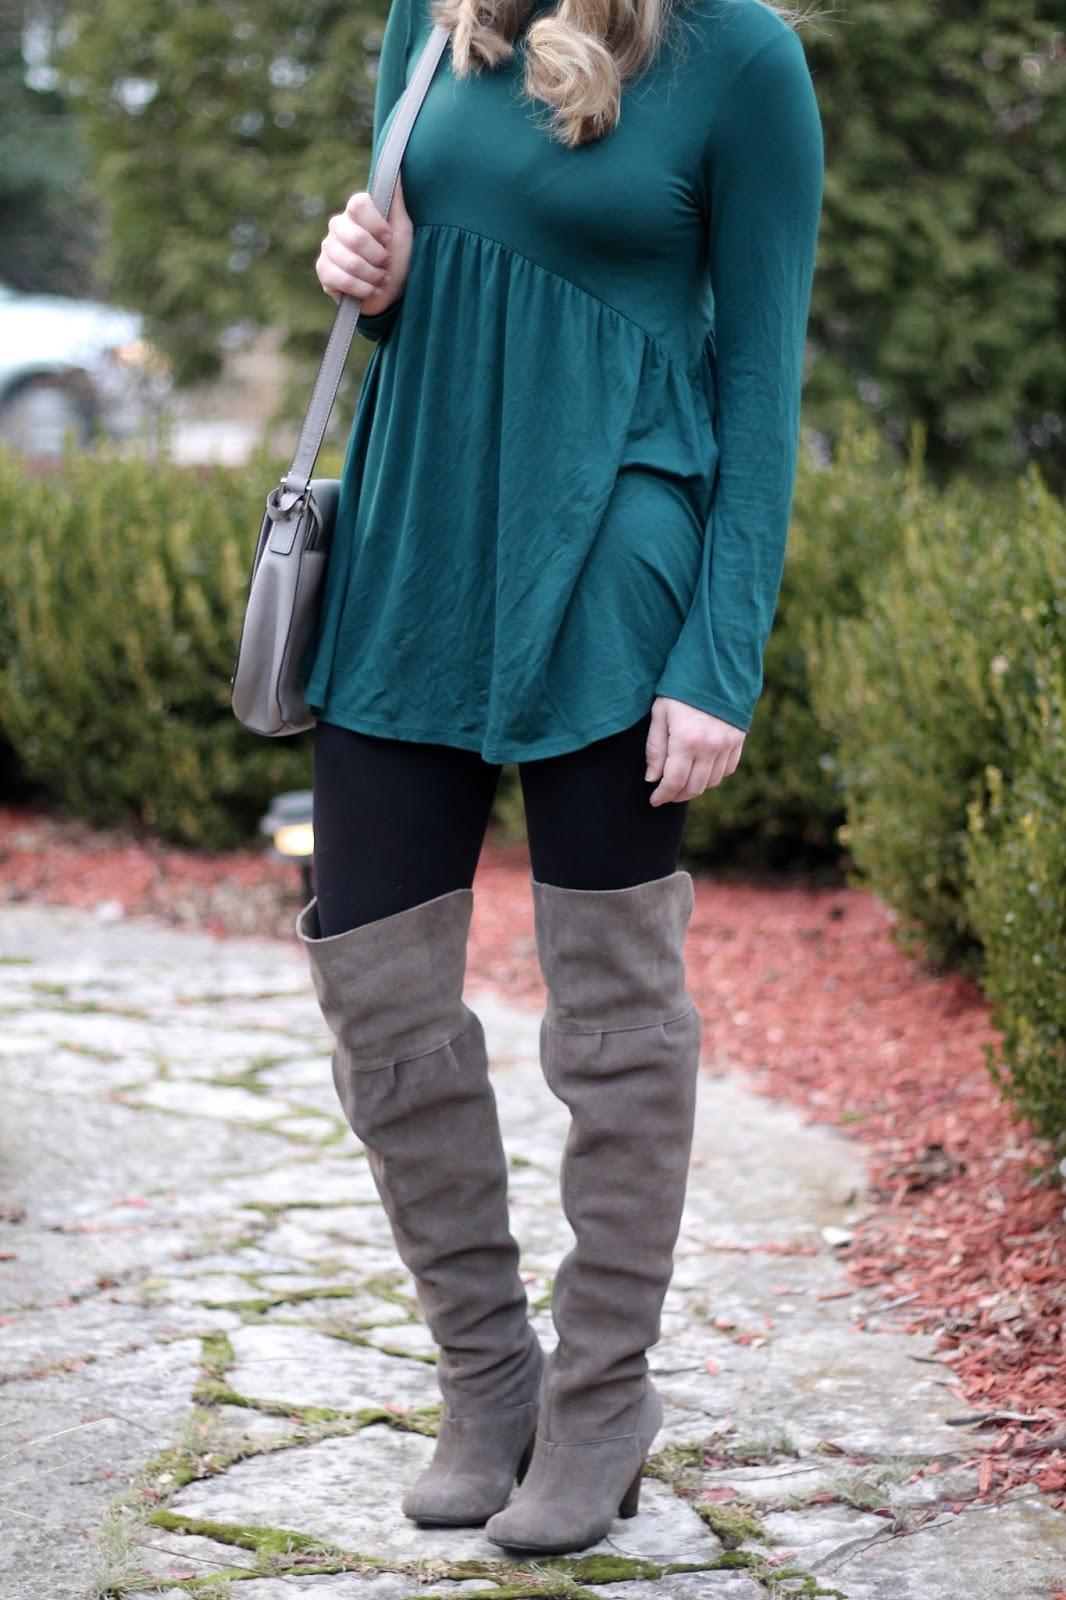 PinkBlush teal tunic, black leggings, grey OTK boots, grey saddlebag, fall outfit with leggings